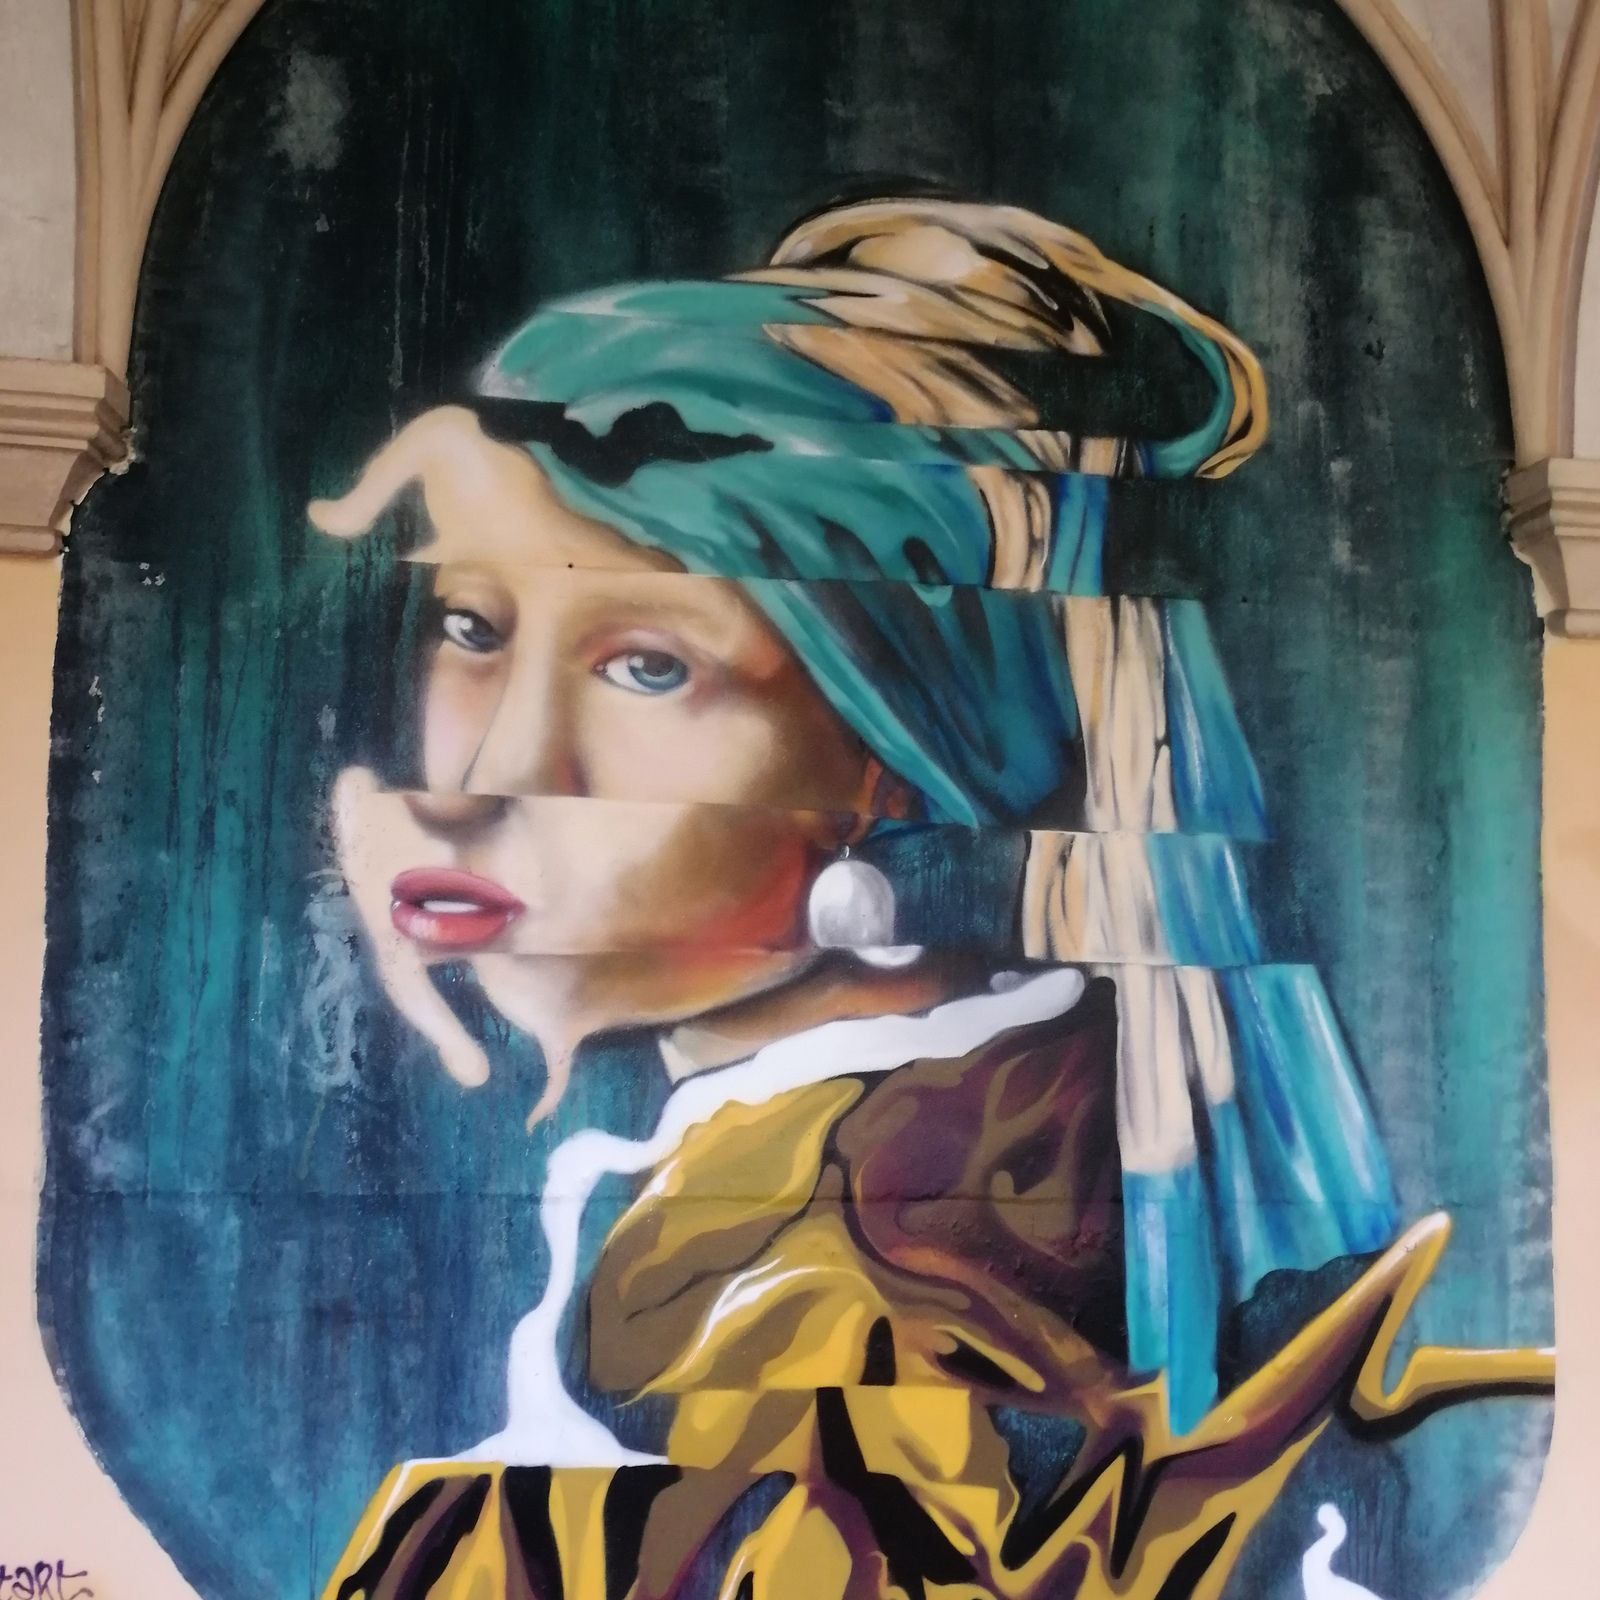 Ch'tie tarte à la rhubarbe - balade régionale à Roubaix expo street art